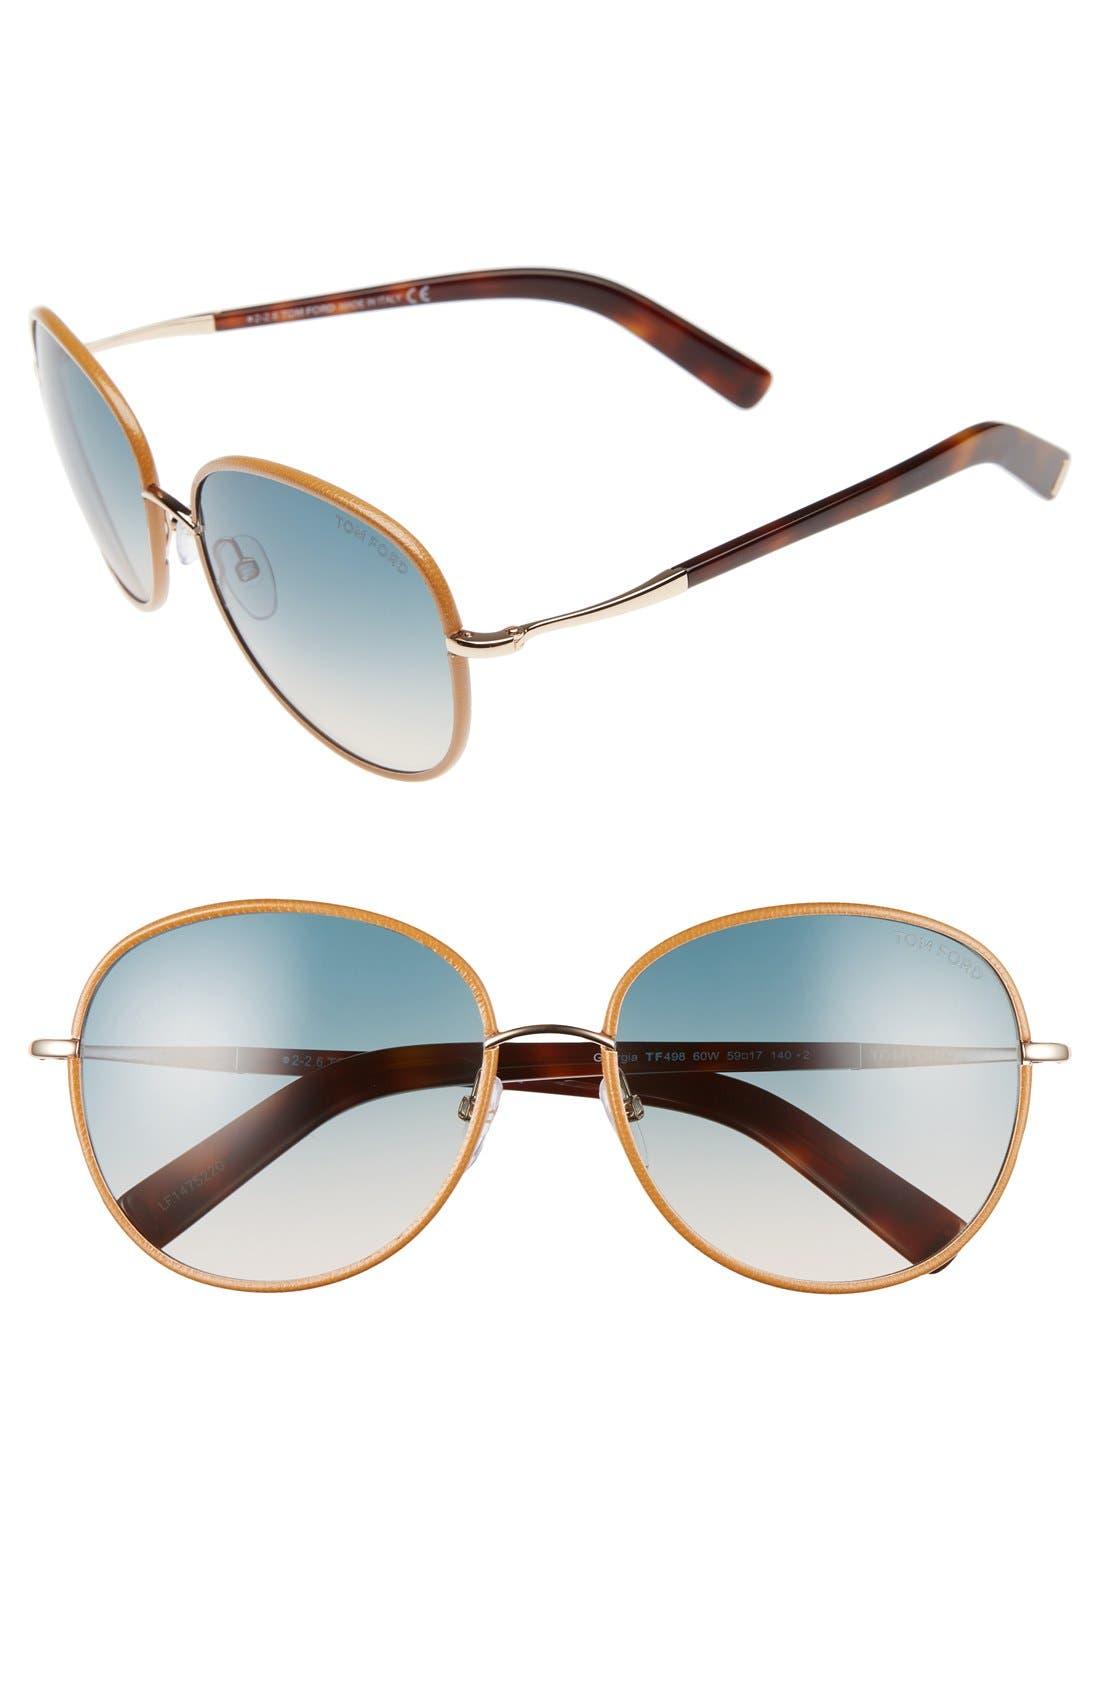 Georgia 59mm Sunglasses,                             Main thumbnail 1, color,                             710